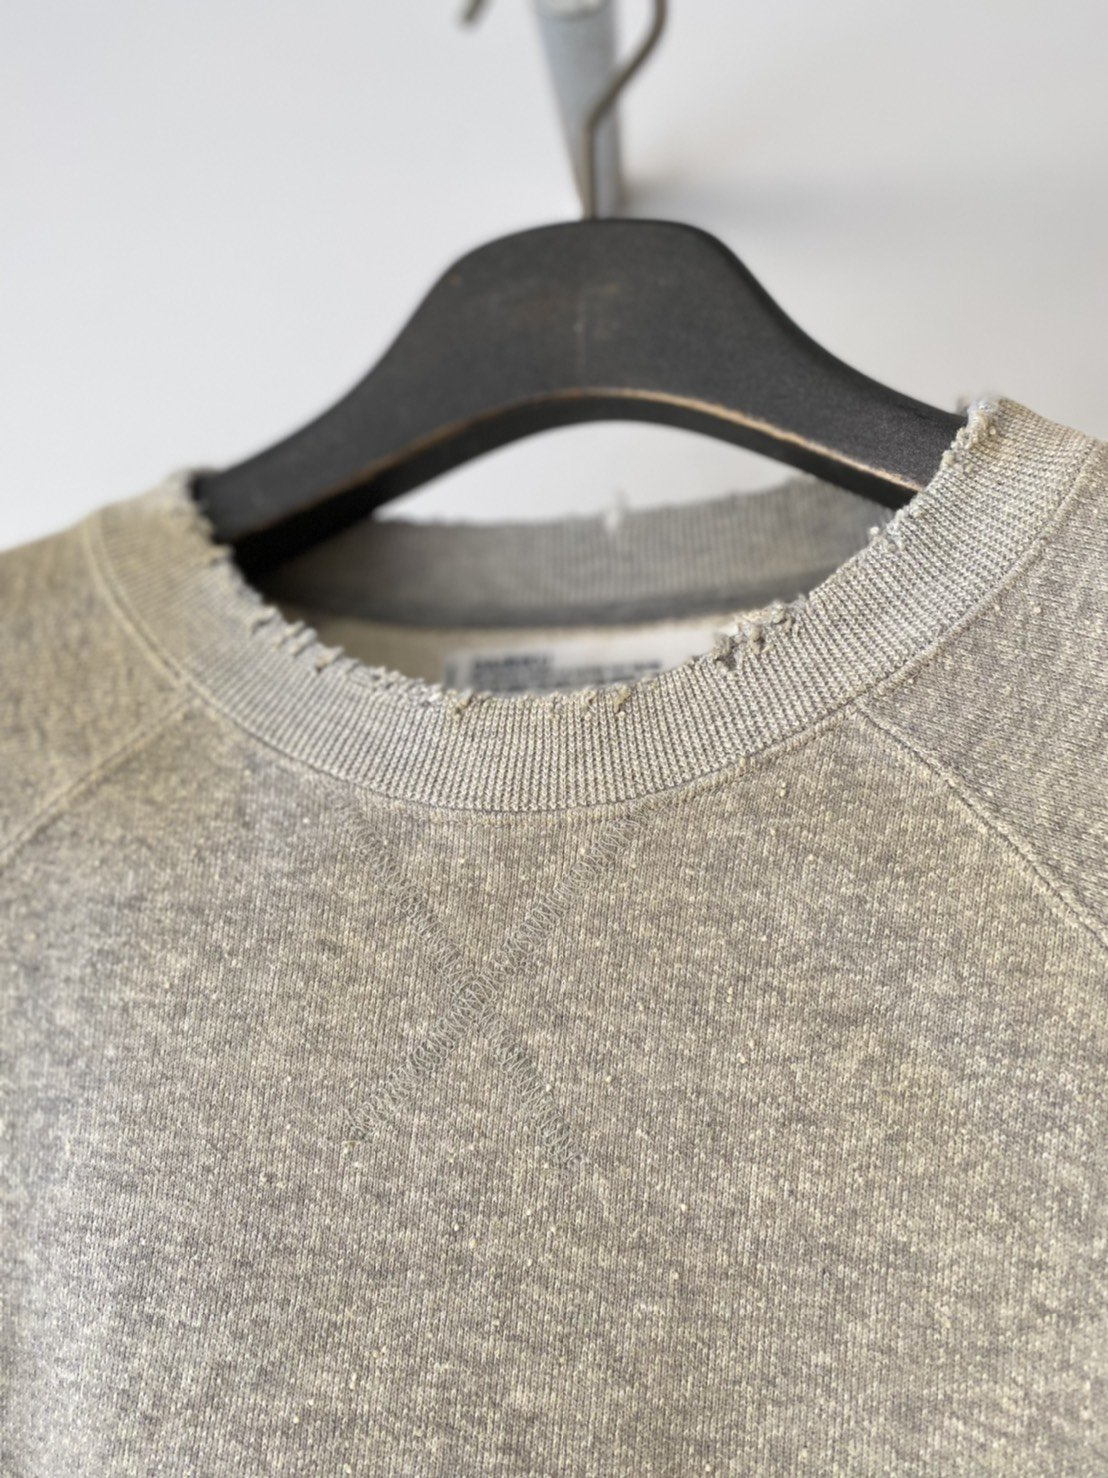 DAIRIKU<br />Ponyboy Pullover Sweater / Mud Grey<img class='new_mark_img2' src='https://img.shop-pro.jp/img/new/icons14.gif' style='border:none;display:inline;margin:0px;padding:0px;width:auto;' />